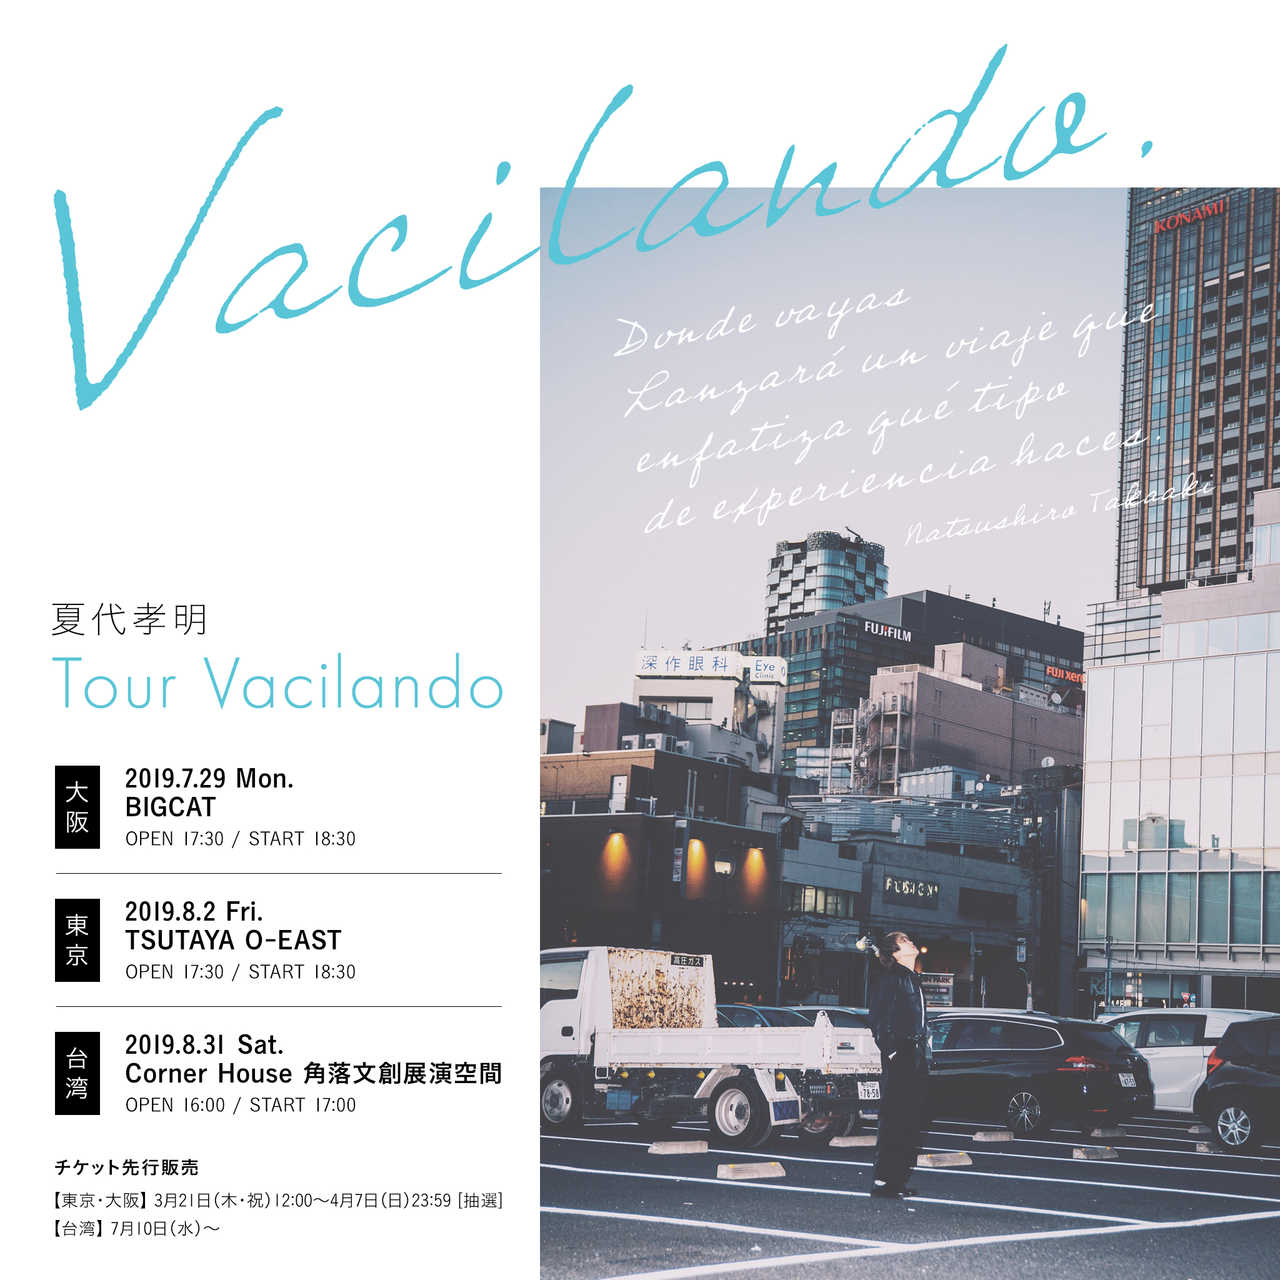 『夏代孝明 Live Tour「Vacilando」』